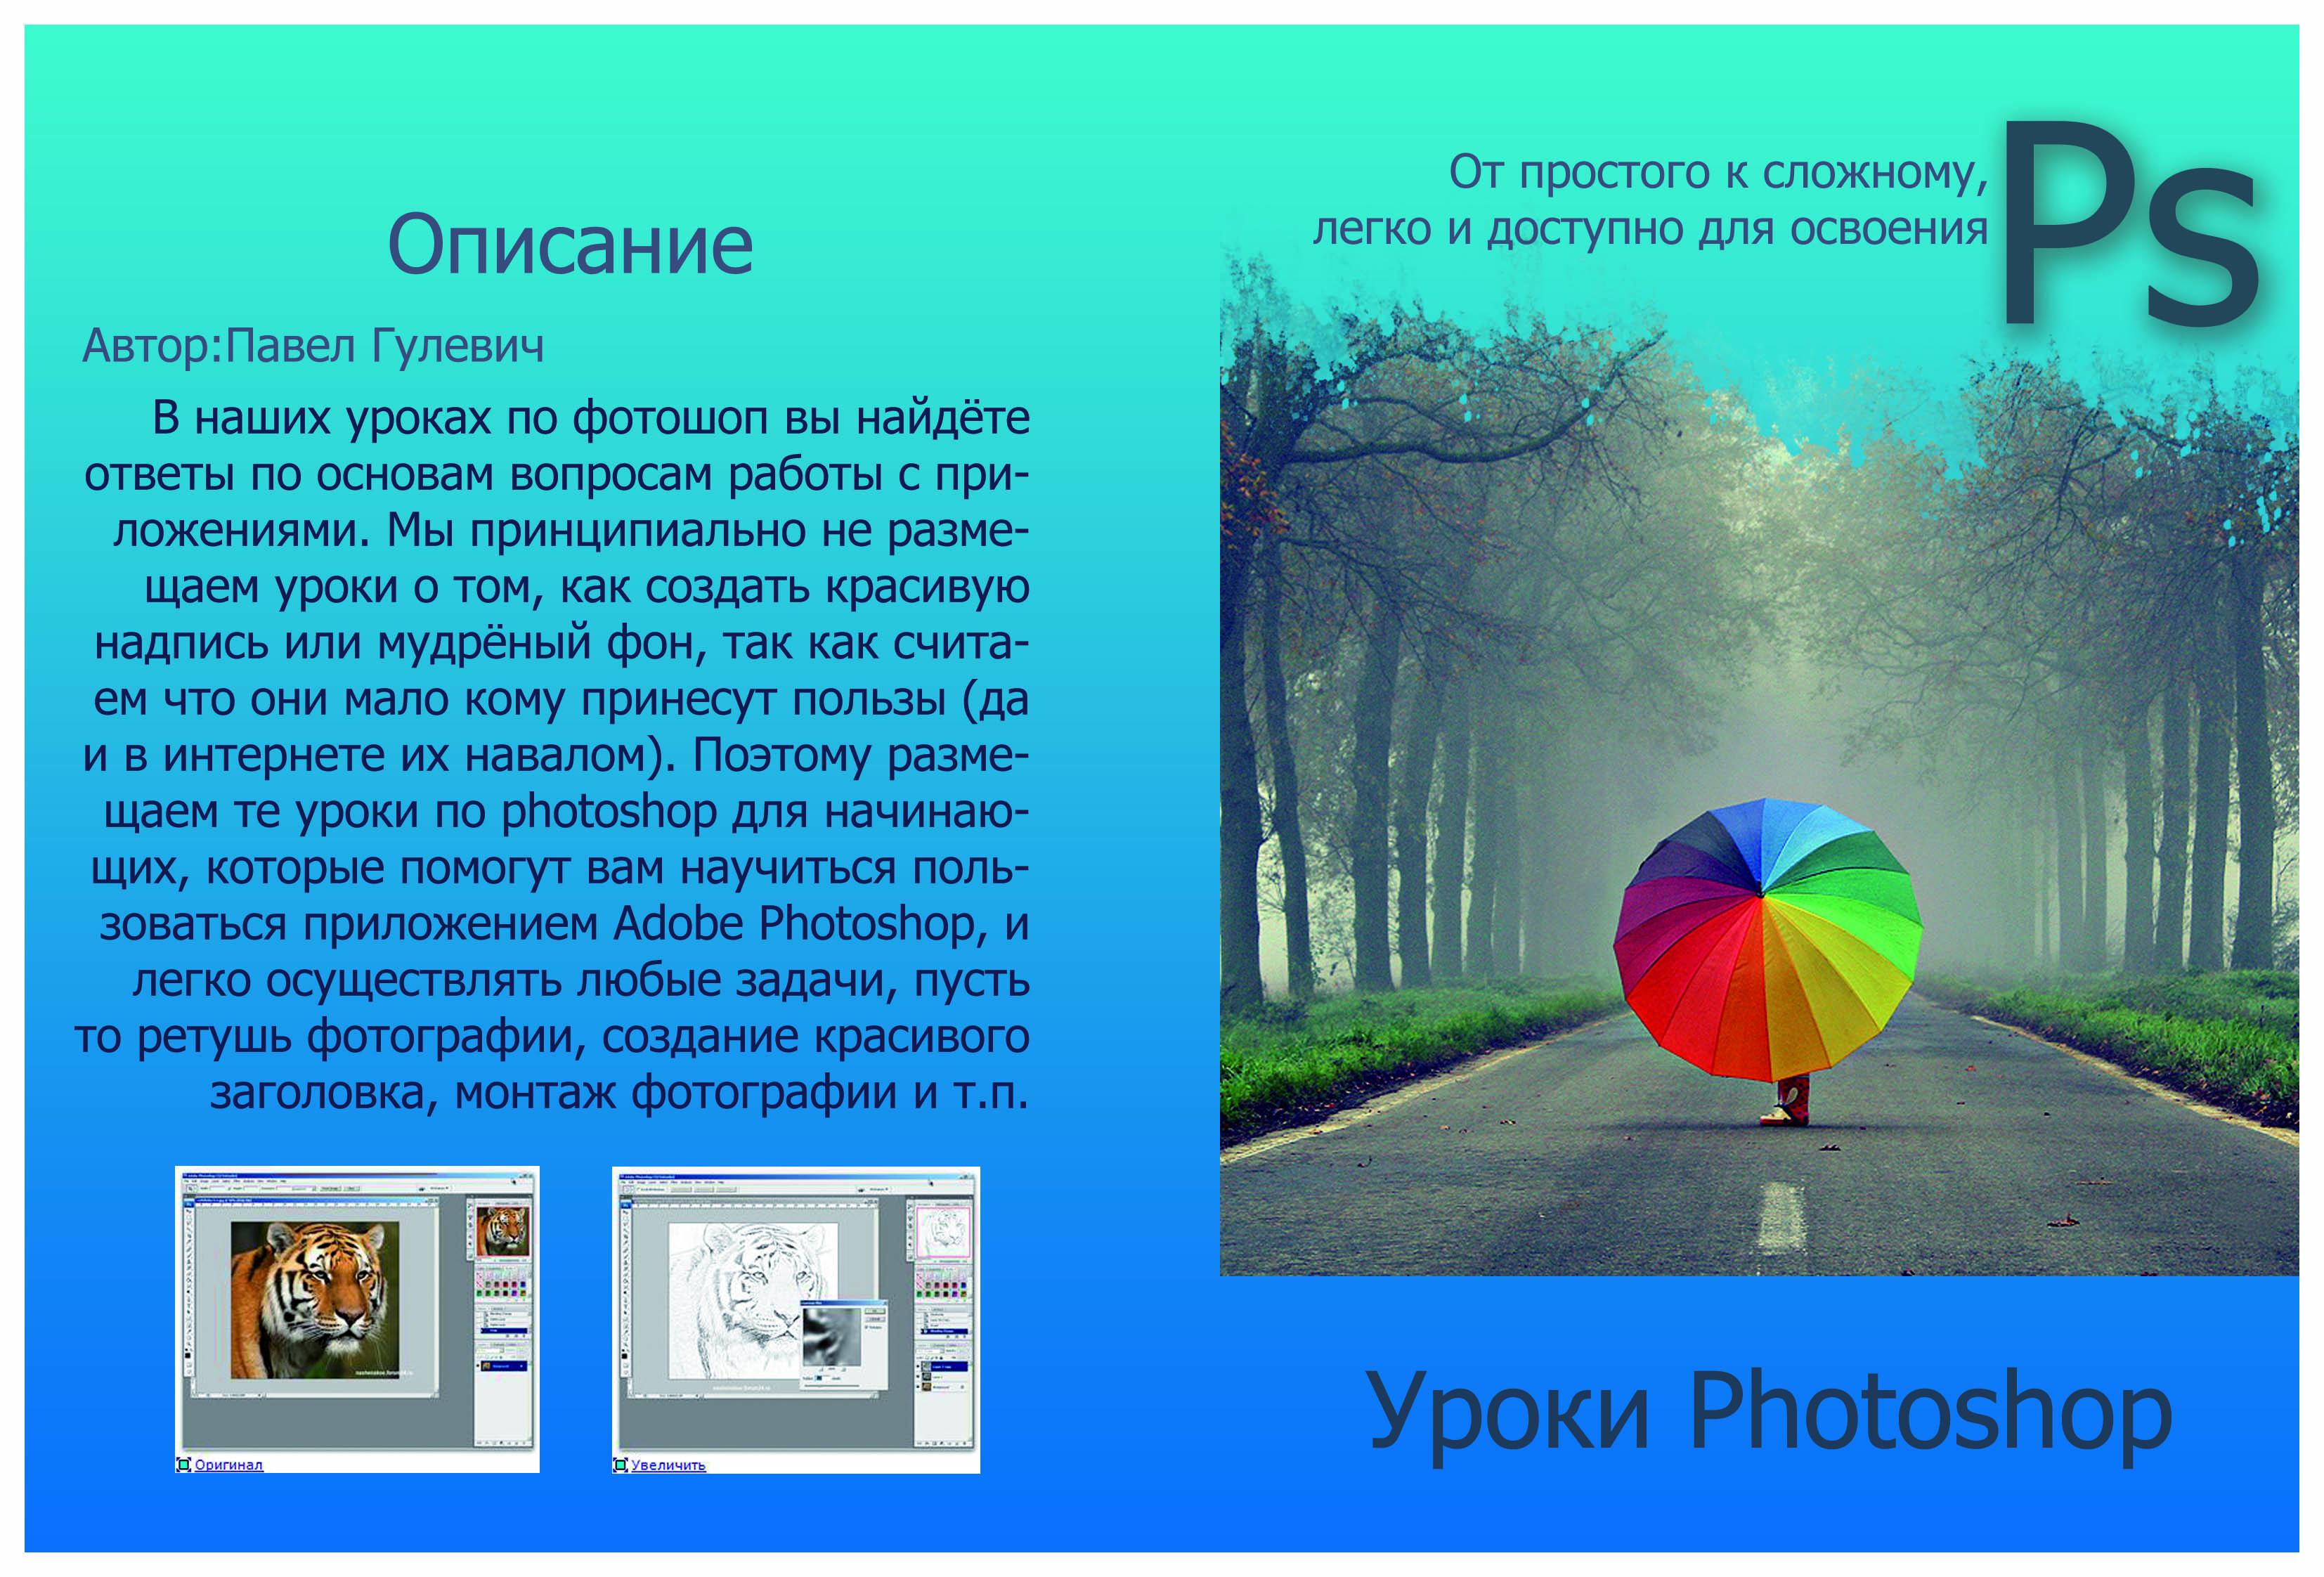 Создание дизайна DVD релиза (обложка, накатка, меню и т.п.) фото f_4d8c646e9b34f.jpg